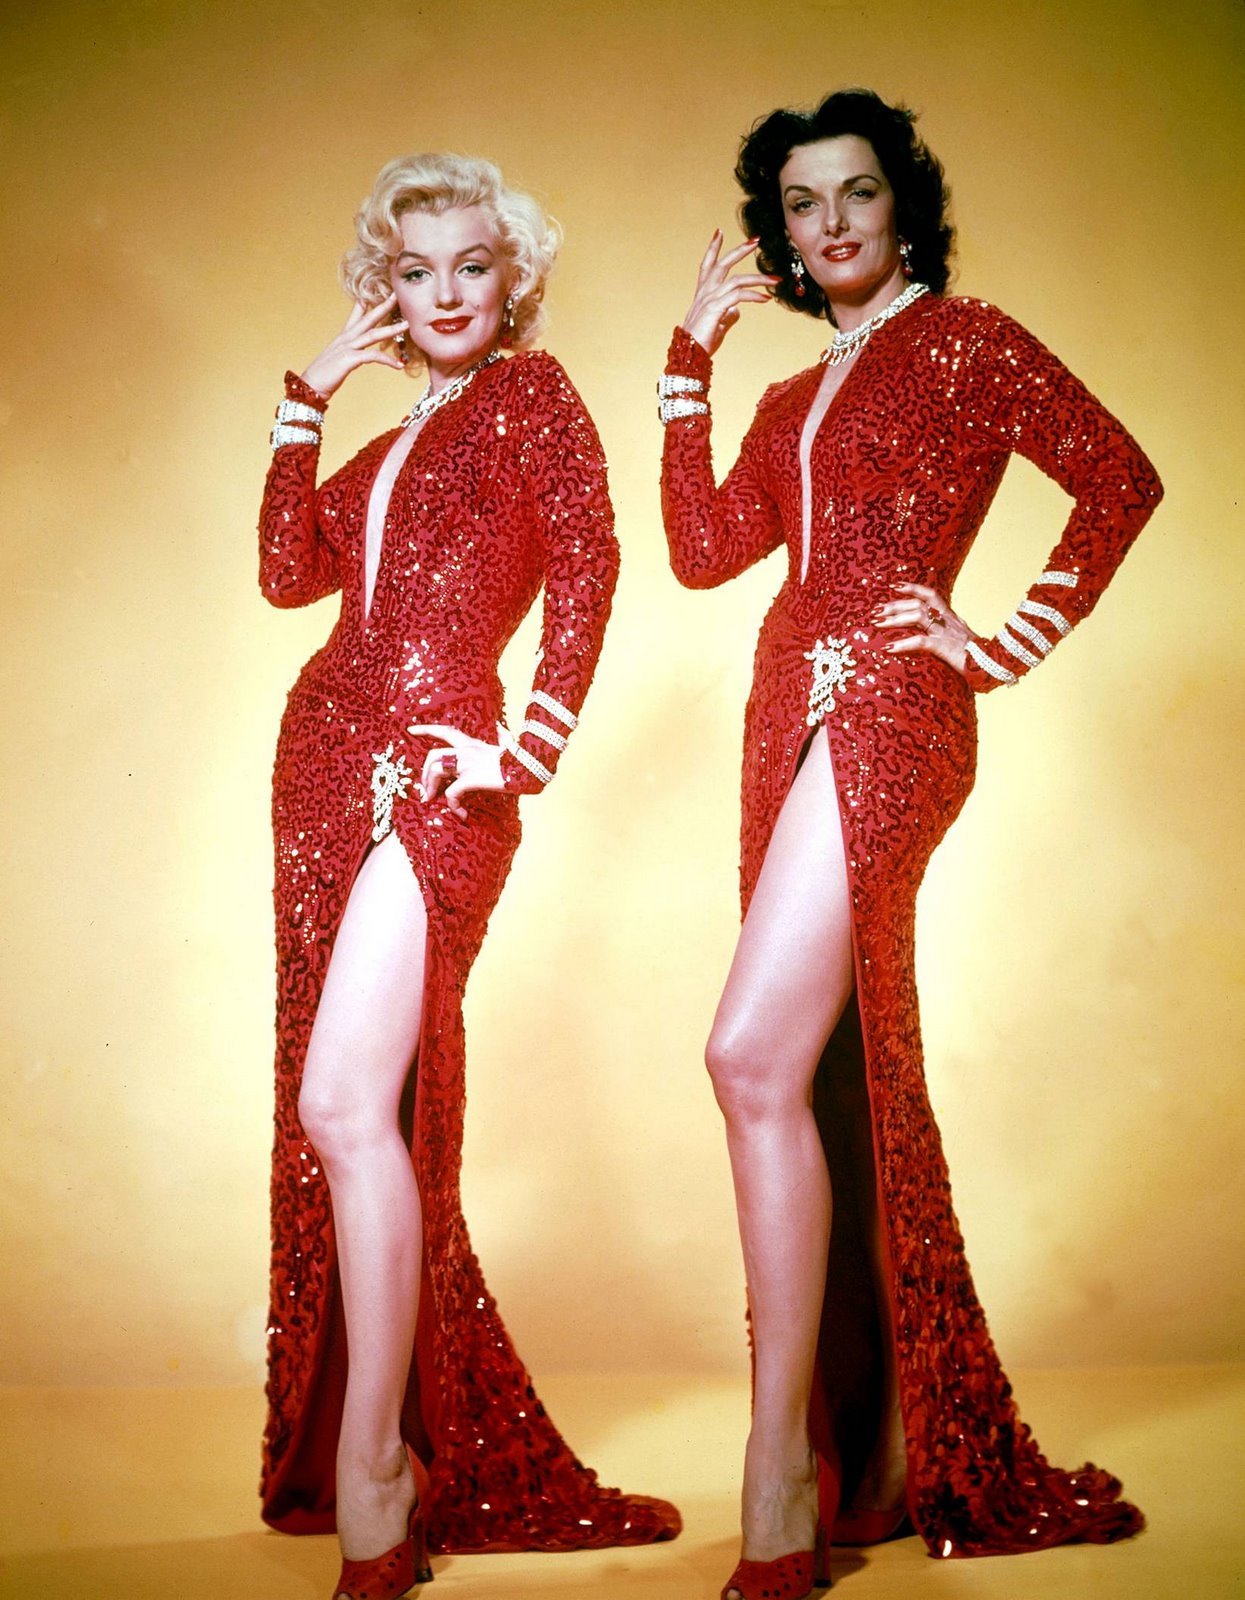 http://1.bp.blogspot.com/_YgDKSHqALuM/SMLZV90R9NI/AAAAAAAAAeg/uPFLCVoLlDQ/s1600/MARILYN+MONROE+&+JANE+RUSELL+-+Gentlemen+Prefer+Blondes+-+1953+--.jpg